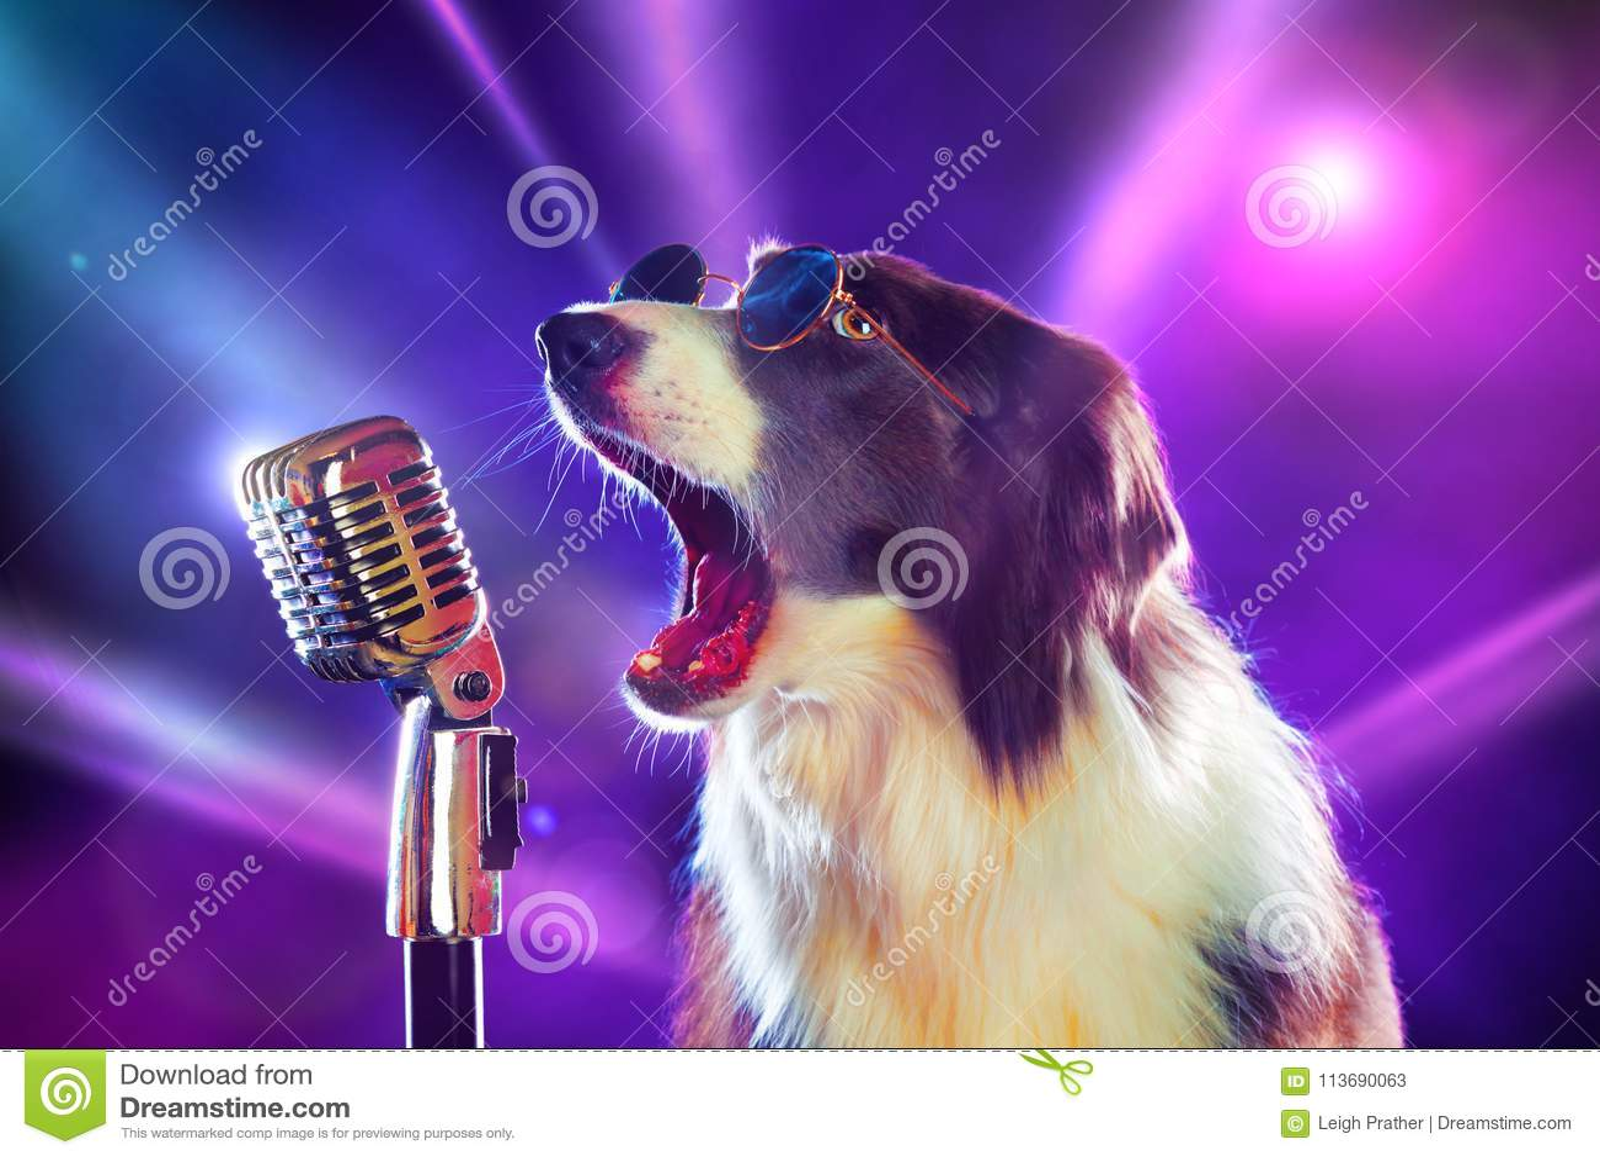 Rock star border collie dog singing